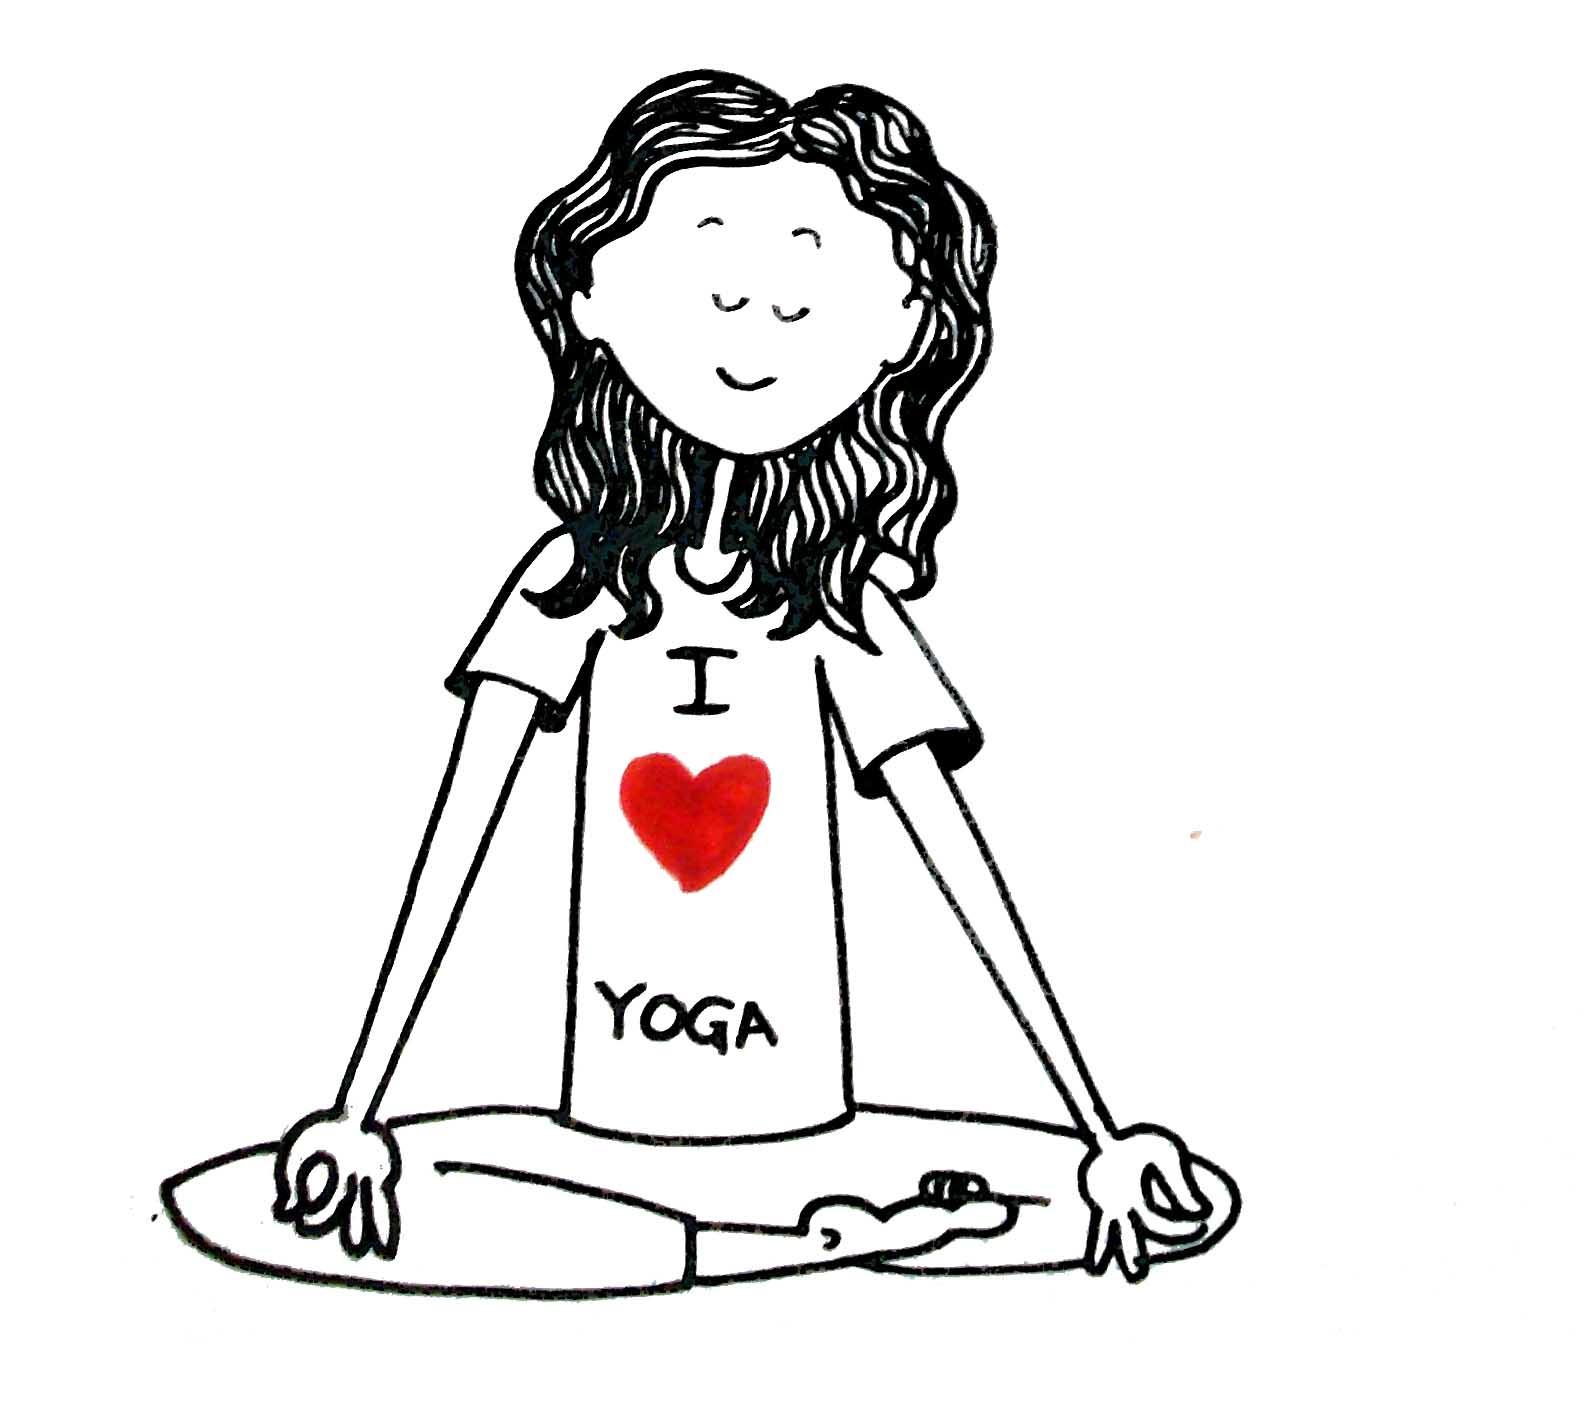 yoga is love